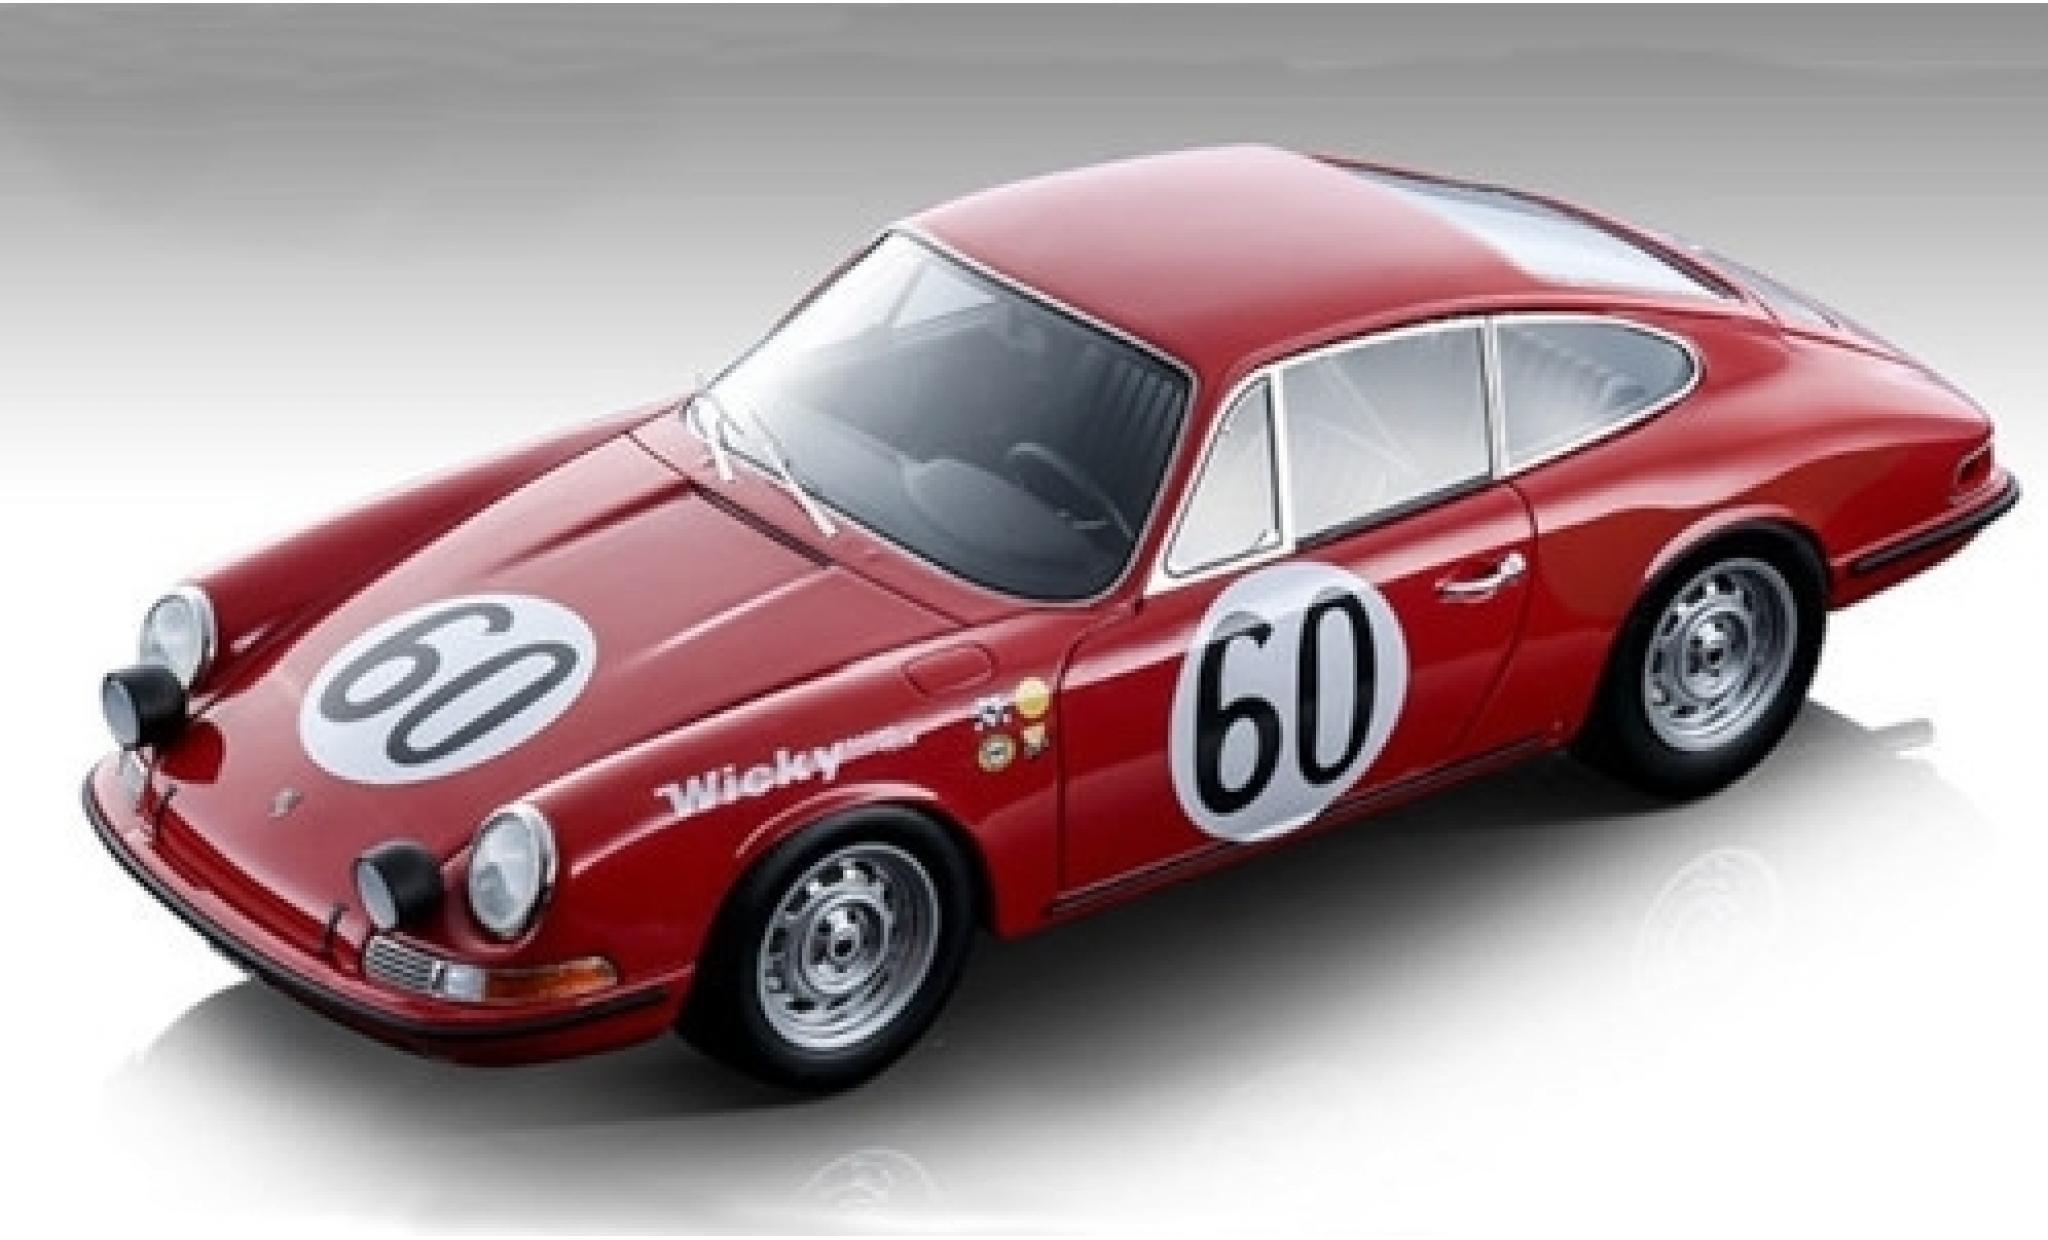 Porsche 911 1/18 Tecnomodel S No.60 24h Le Mans 1967 P.Farjon/A.Wicky